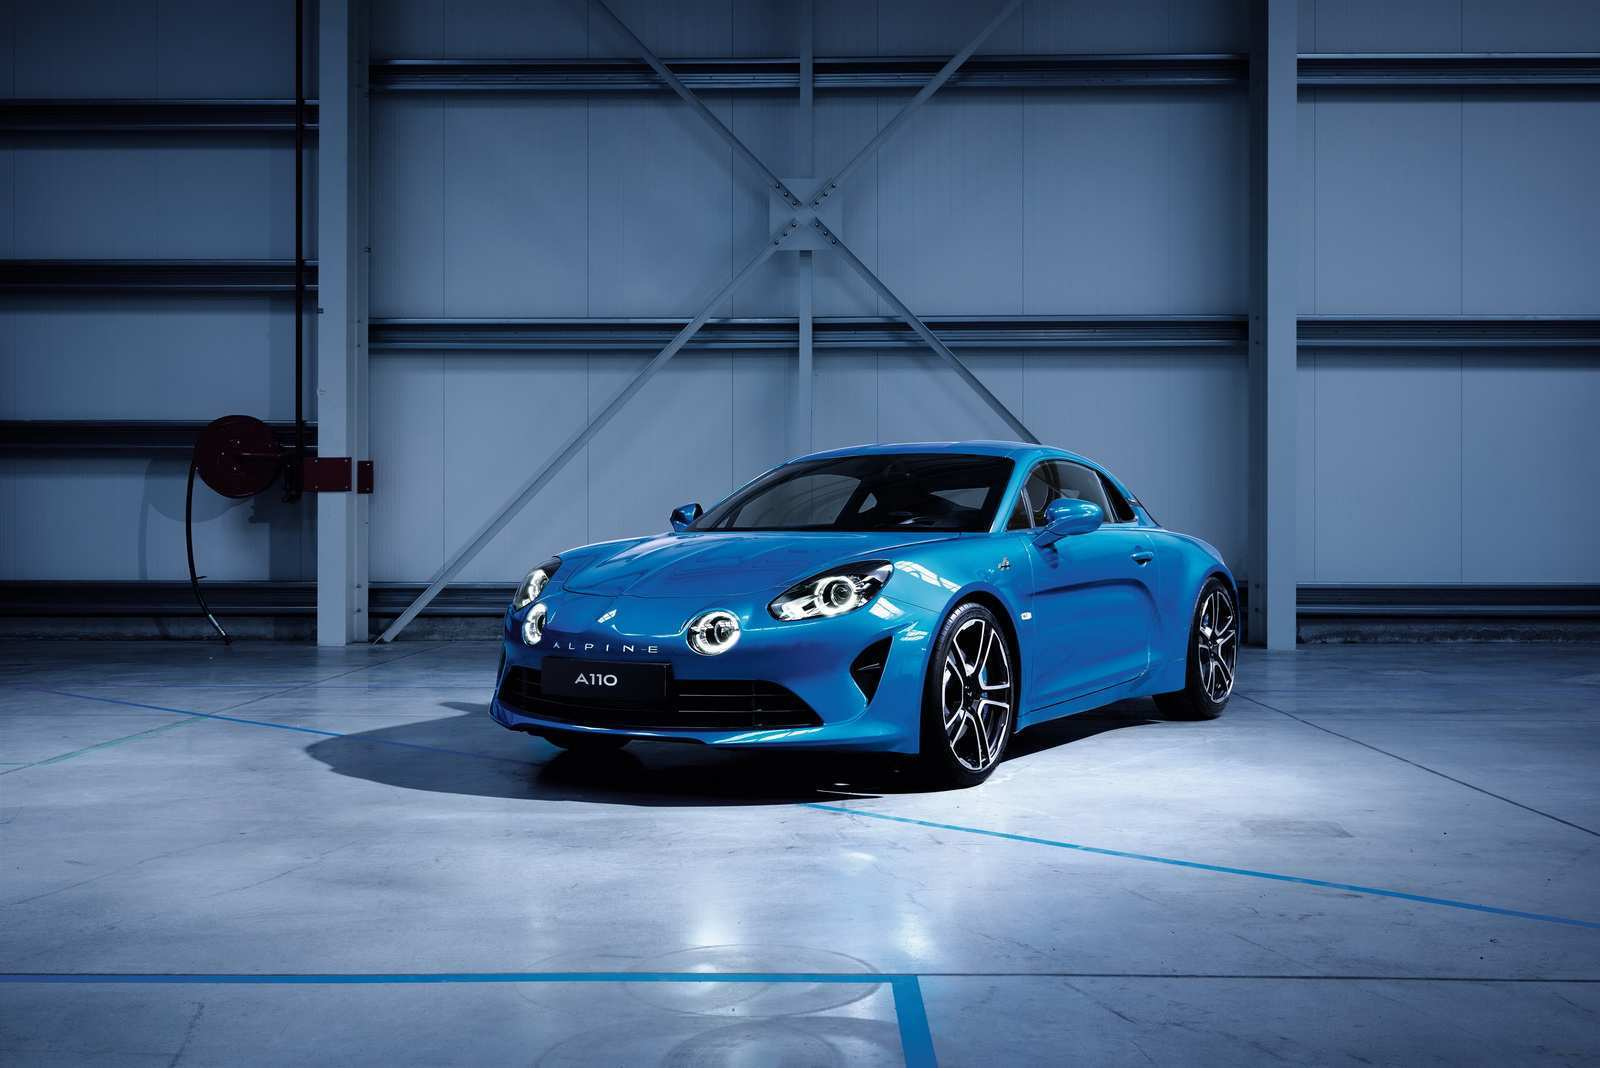 65 Great Renault Alpine 2019 New Concept for Renault Alpine 2019